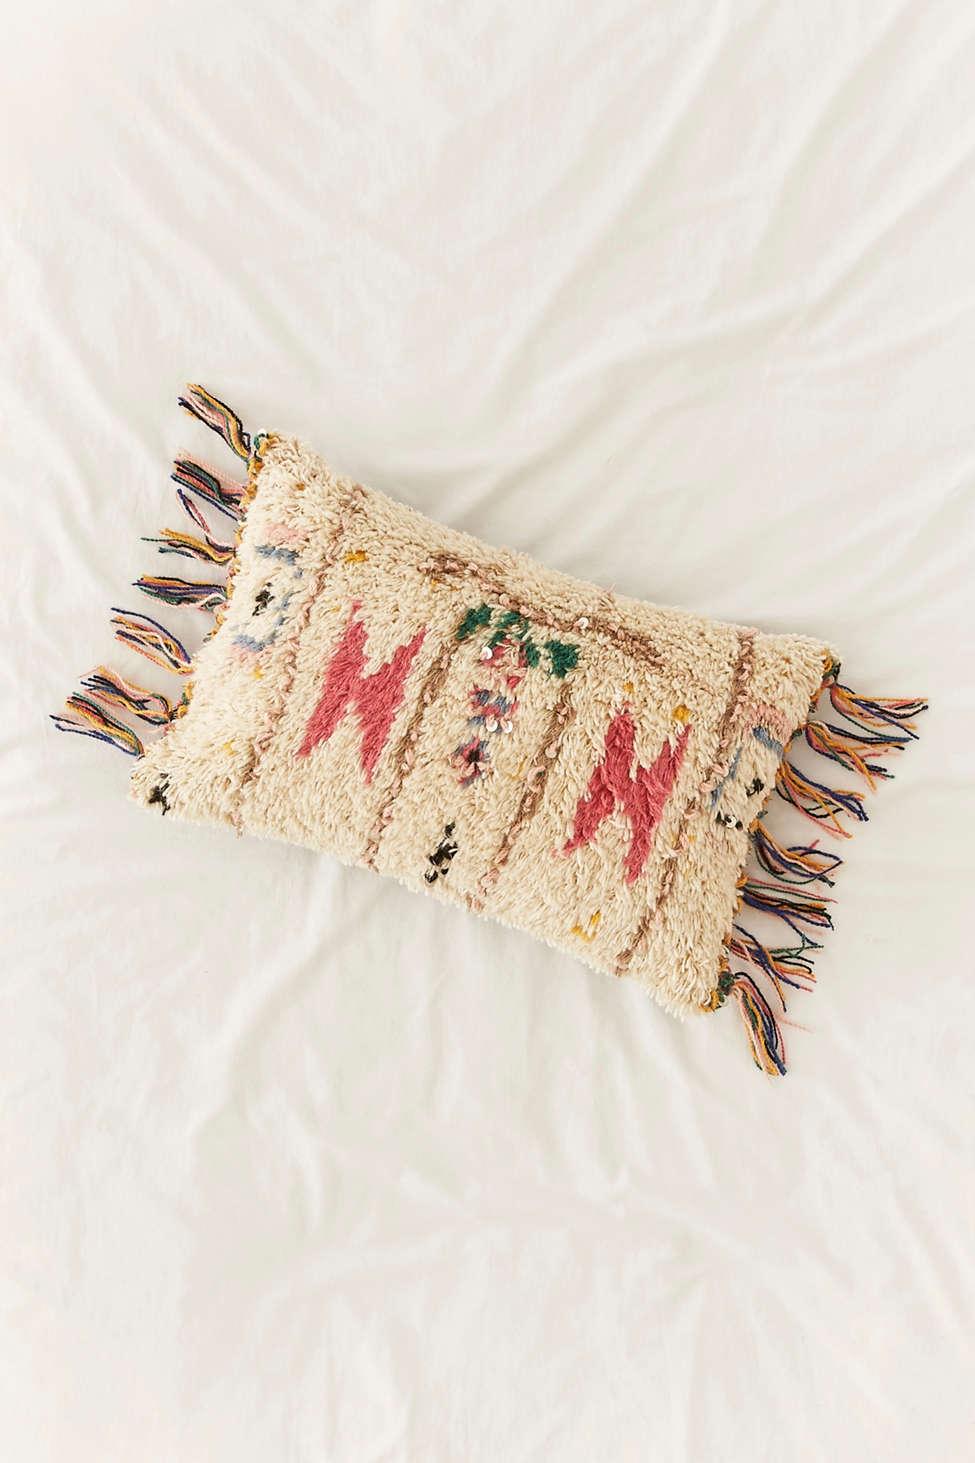 Slide View: 1: Embellished Boucherouite Fringe Pillow